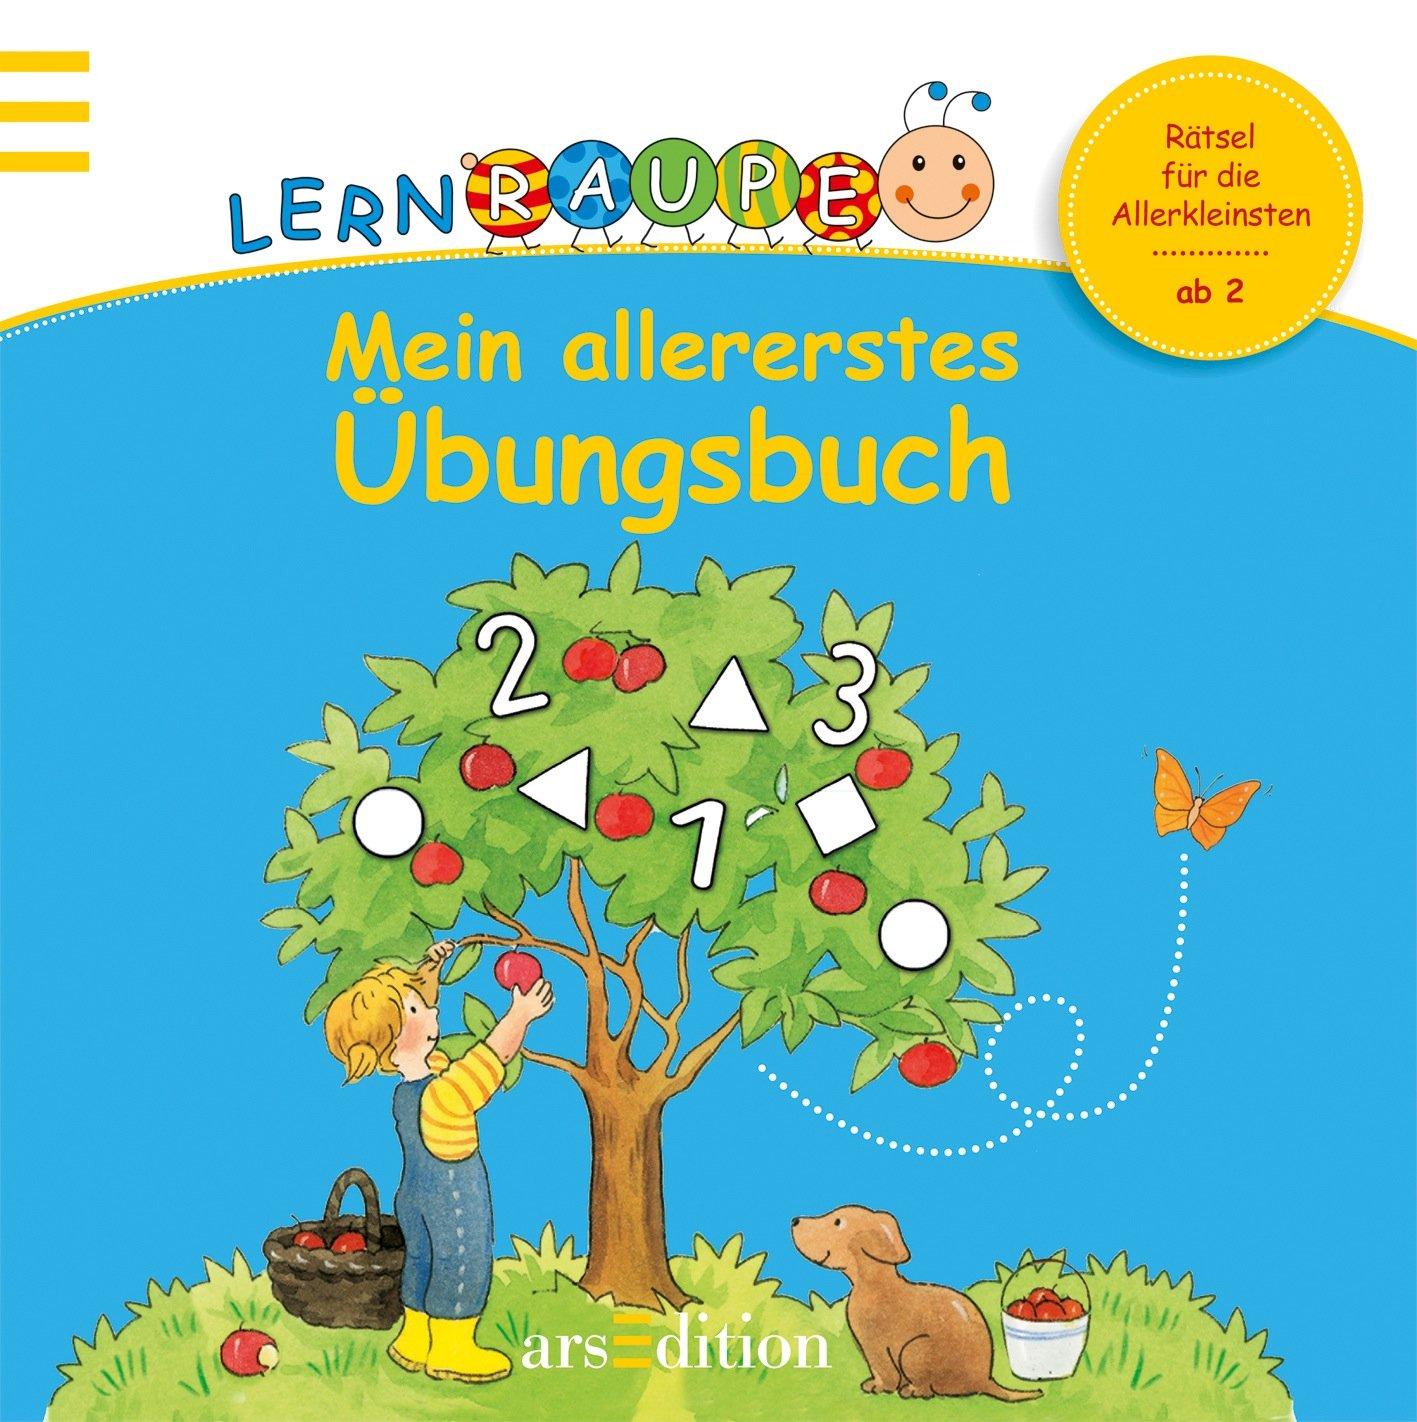 Lernraupe - Mein allererstes Übungsbuch (Kindergarten-Lernraupe)